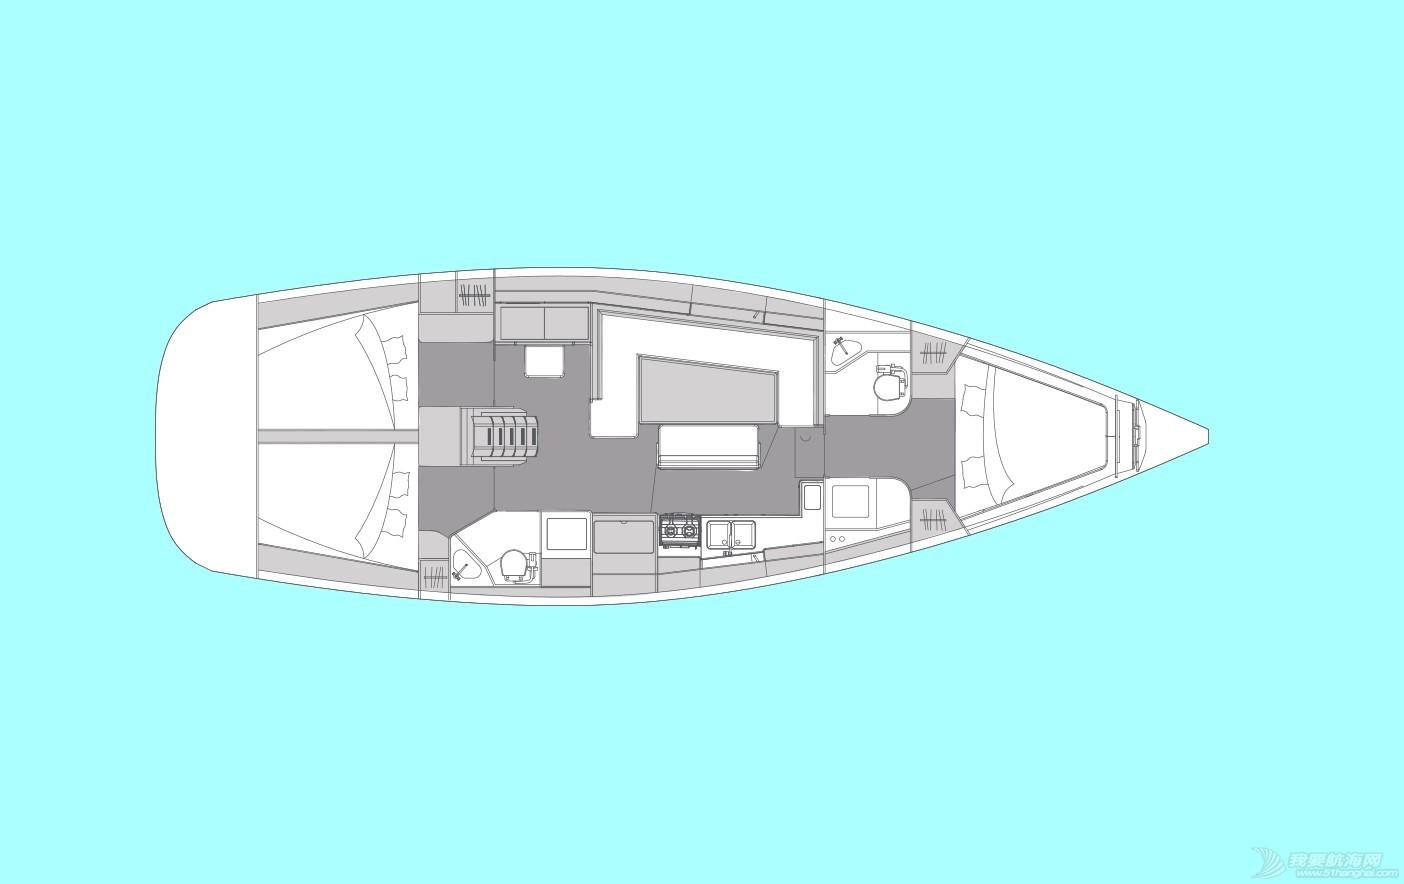 layout-i45-1-b_0.jpg